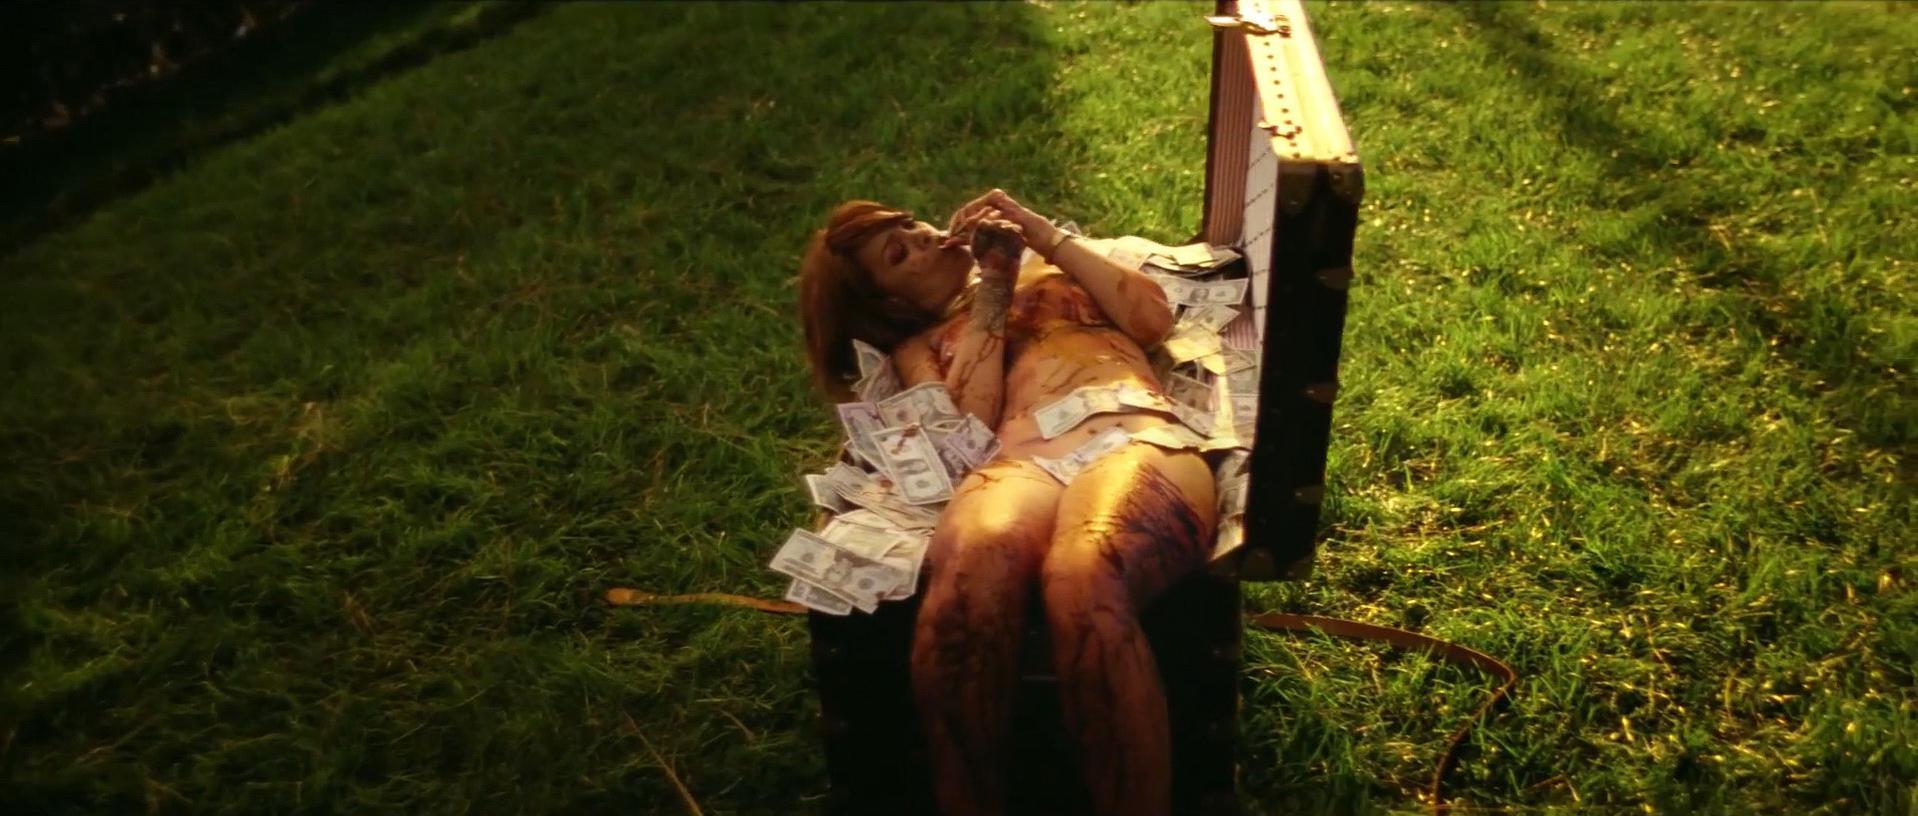 Rihanna nude, Rachel Roberts nude - Bitch Better Have My Money (2015)